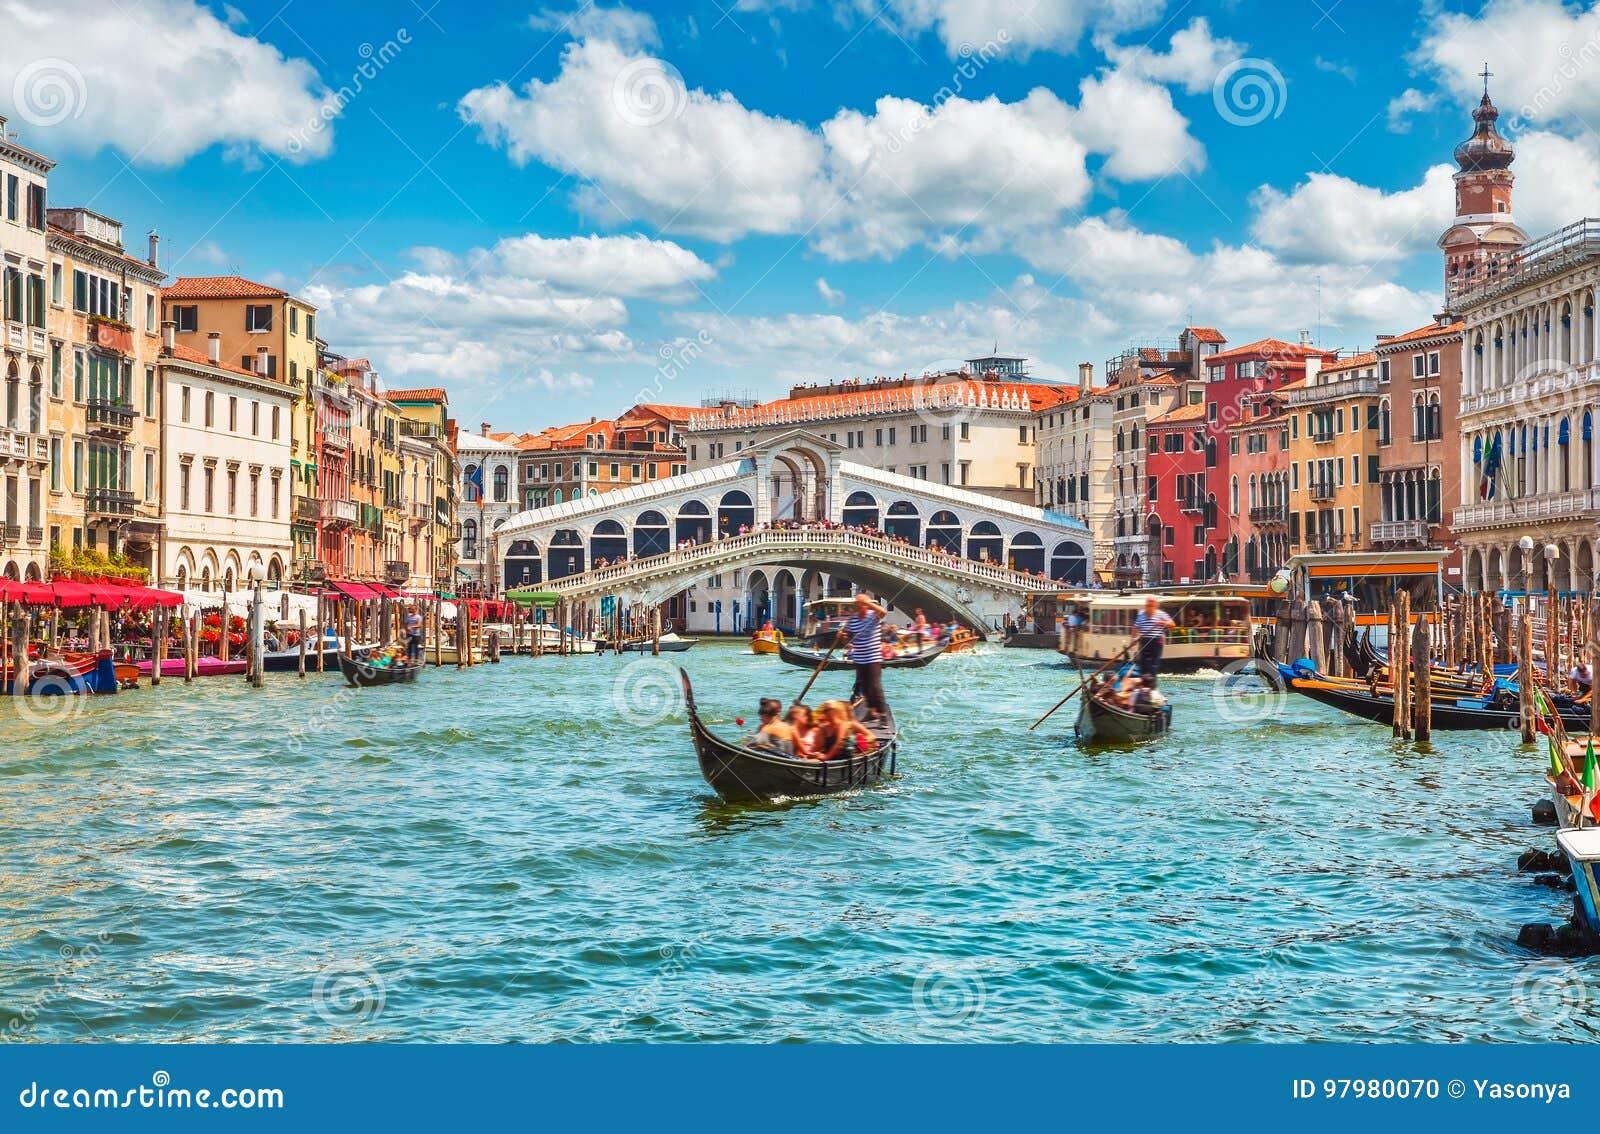 Bridge Rialto on Grand canal famous landmark panoramic view Venice